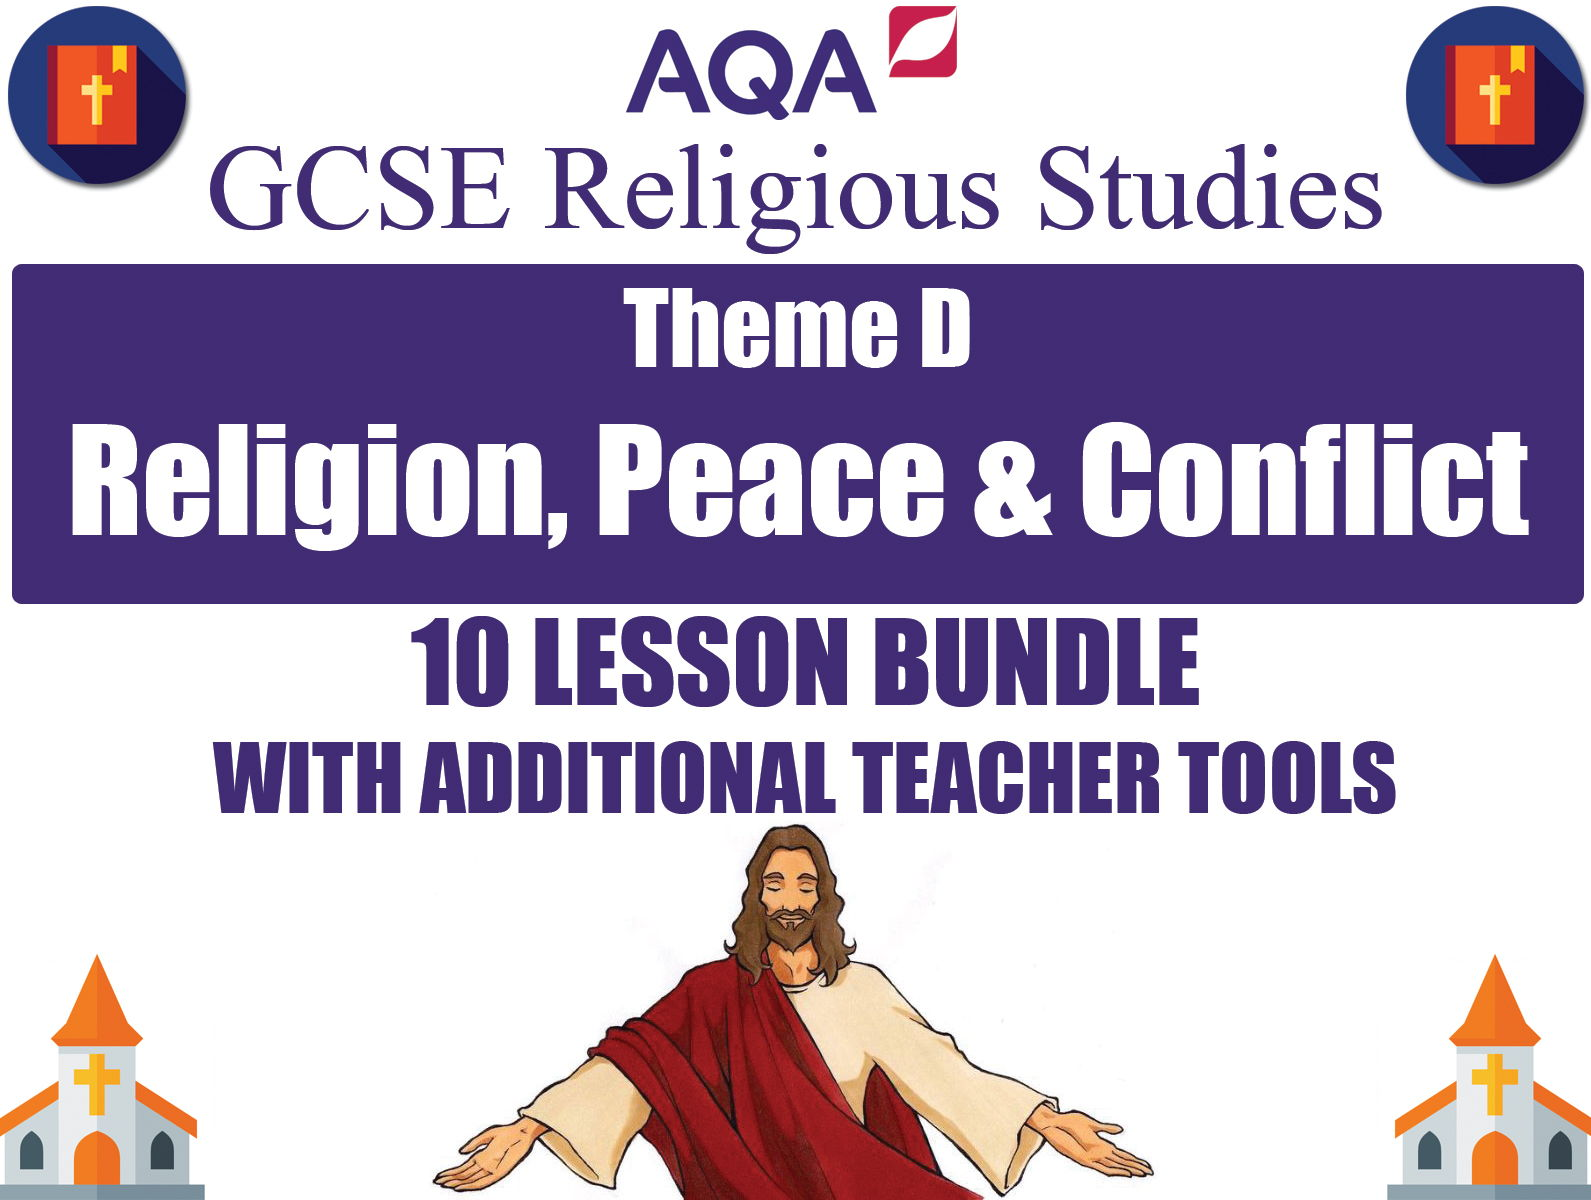 Religion, Peace & Conflict (10 Lesson Unit) (AQA GCSE Religious Studies)